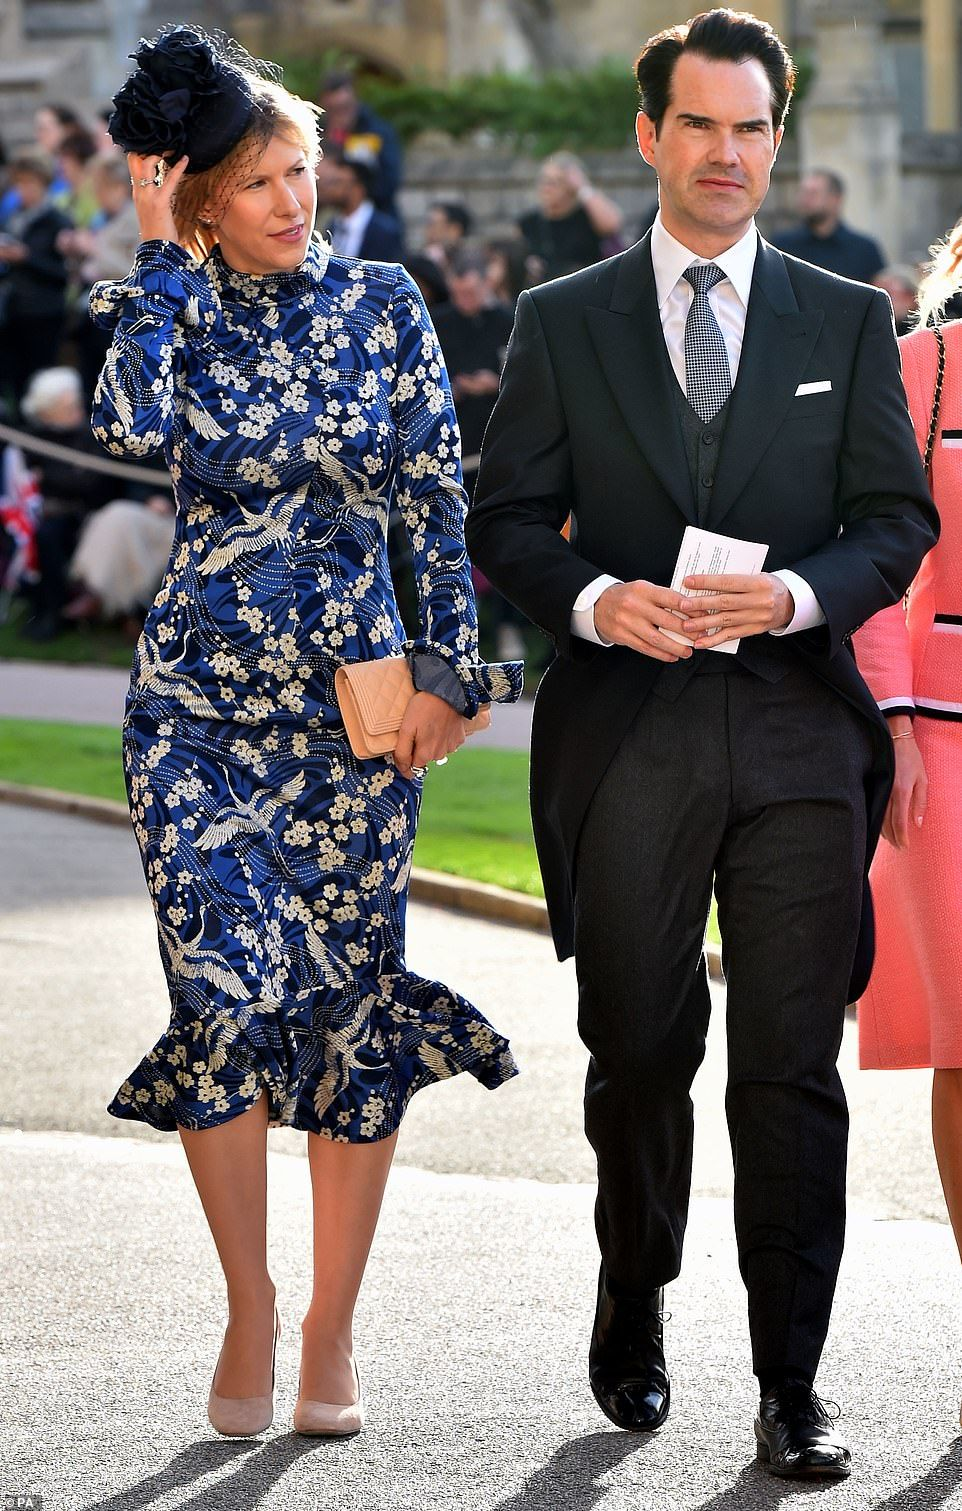 Beautiful bride Princess Eugenie marries Jack Brooksbank